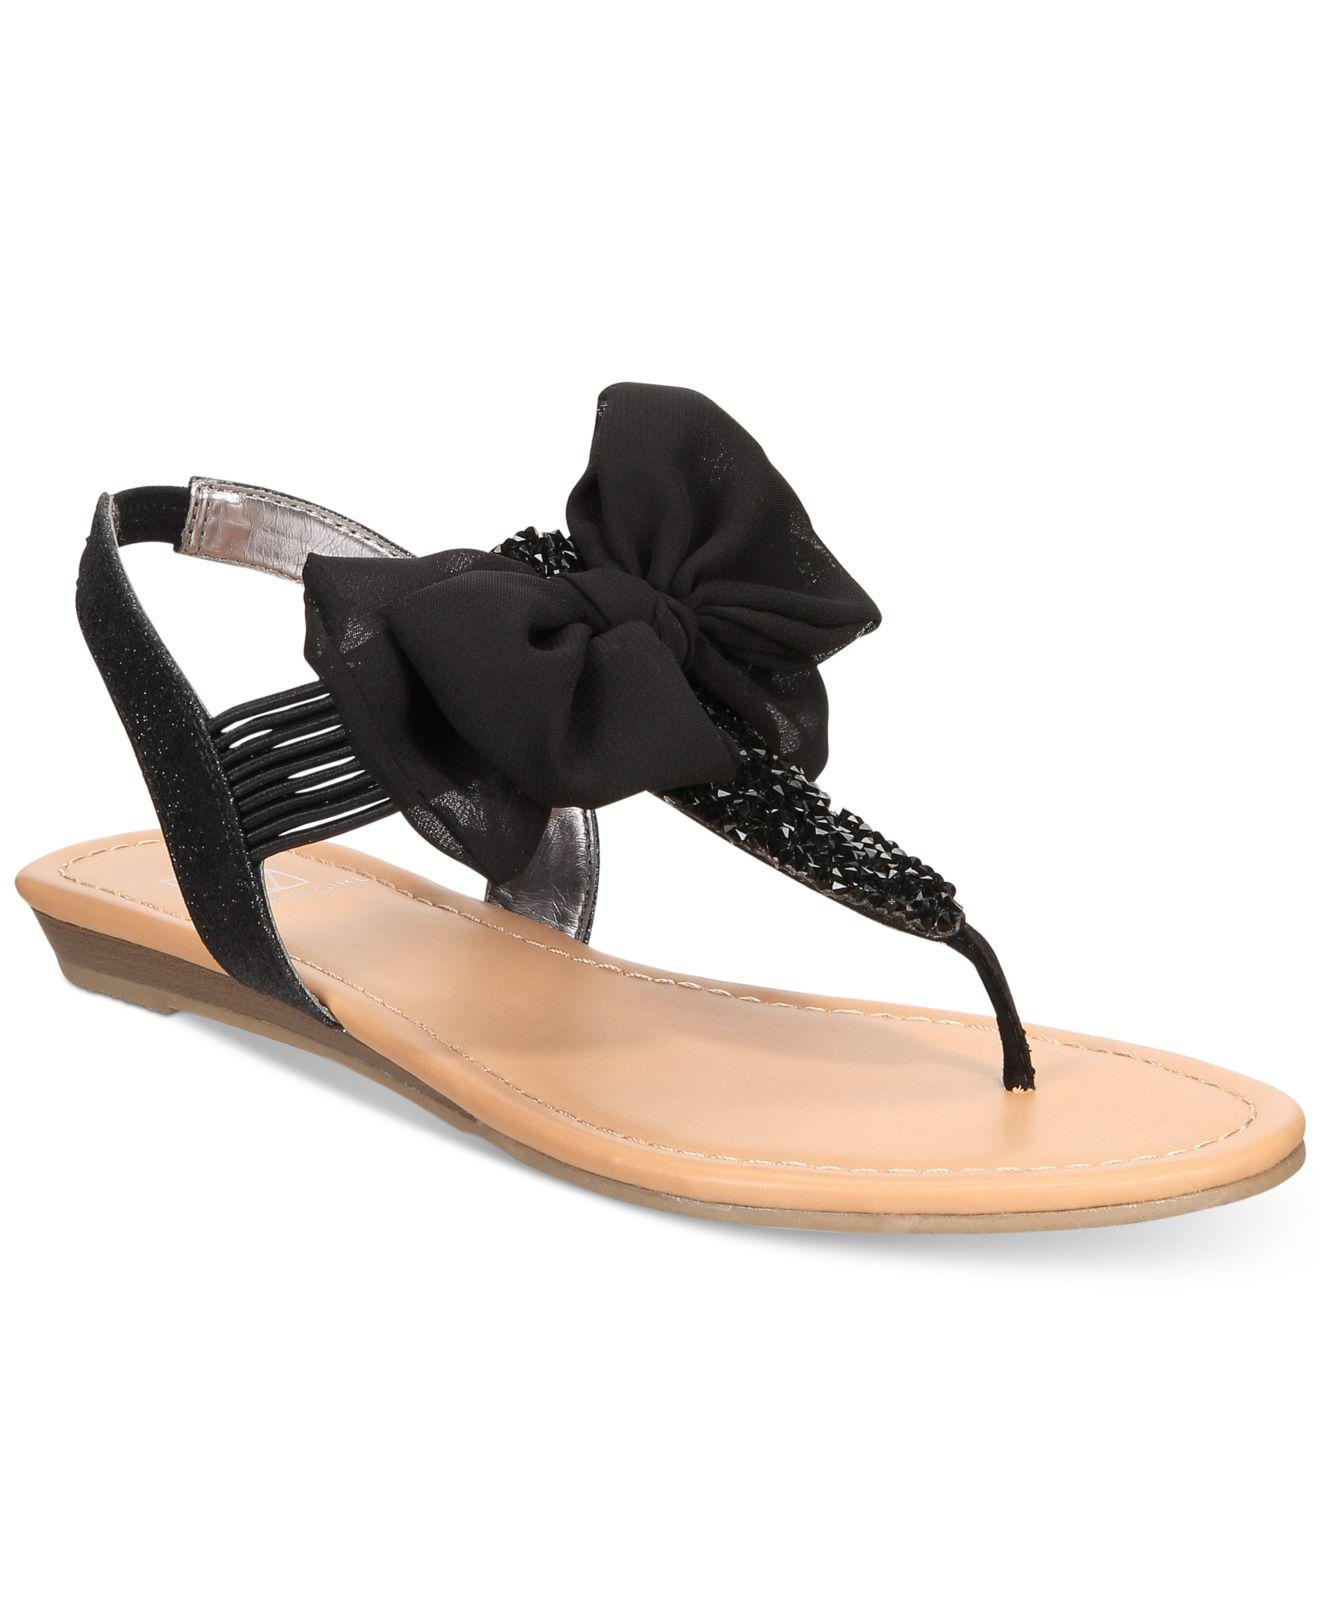 2c4f4aaecf3 Material Girl. Women s Black Swan Flat Thong Sandals